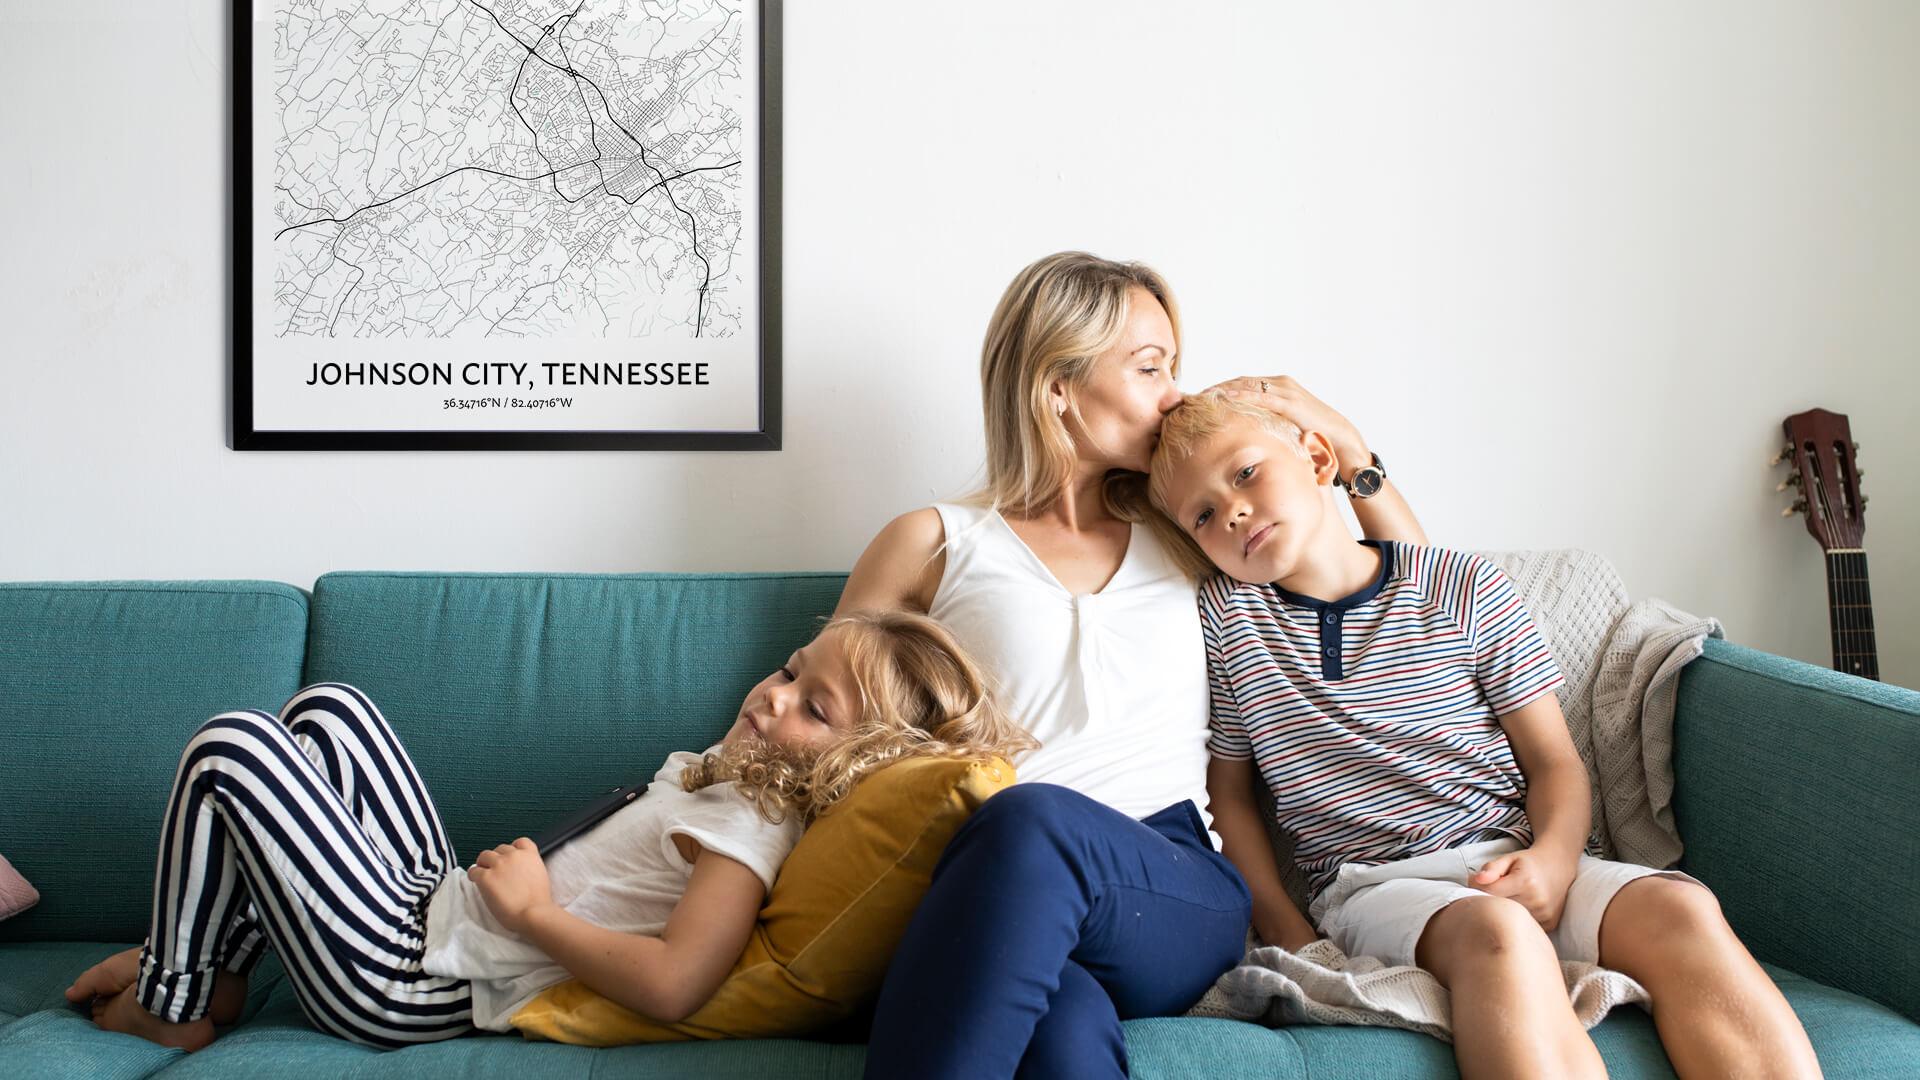 Johnson City map poster